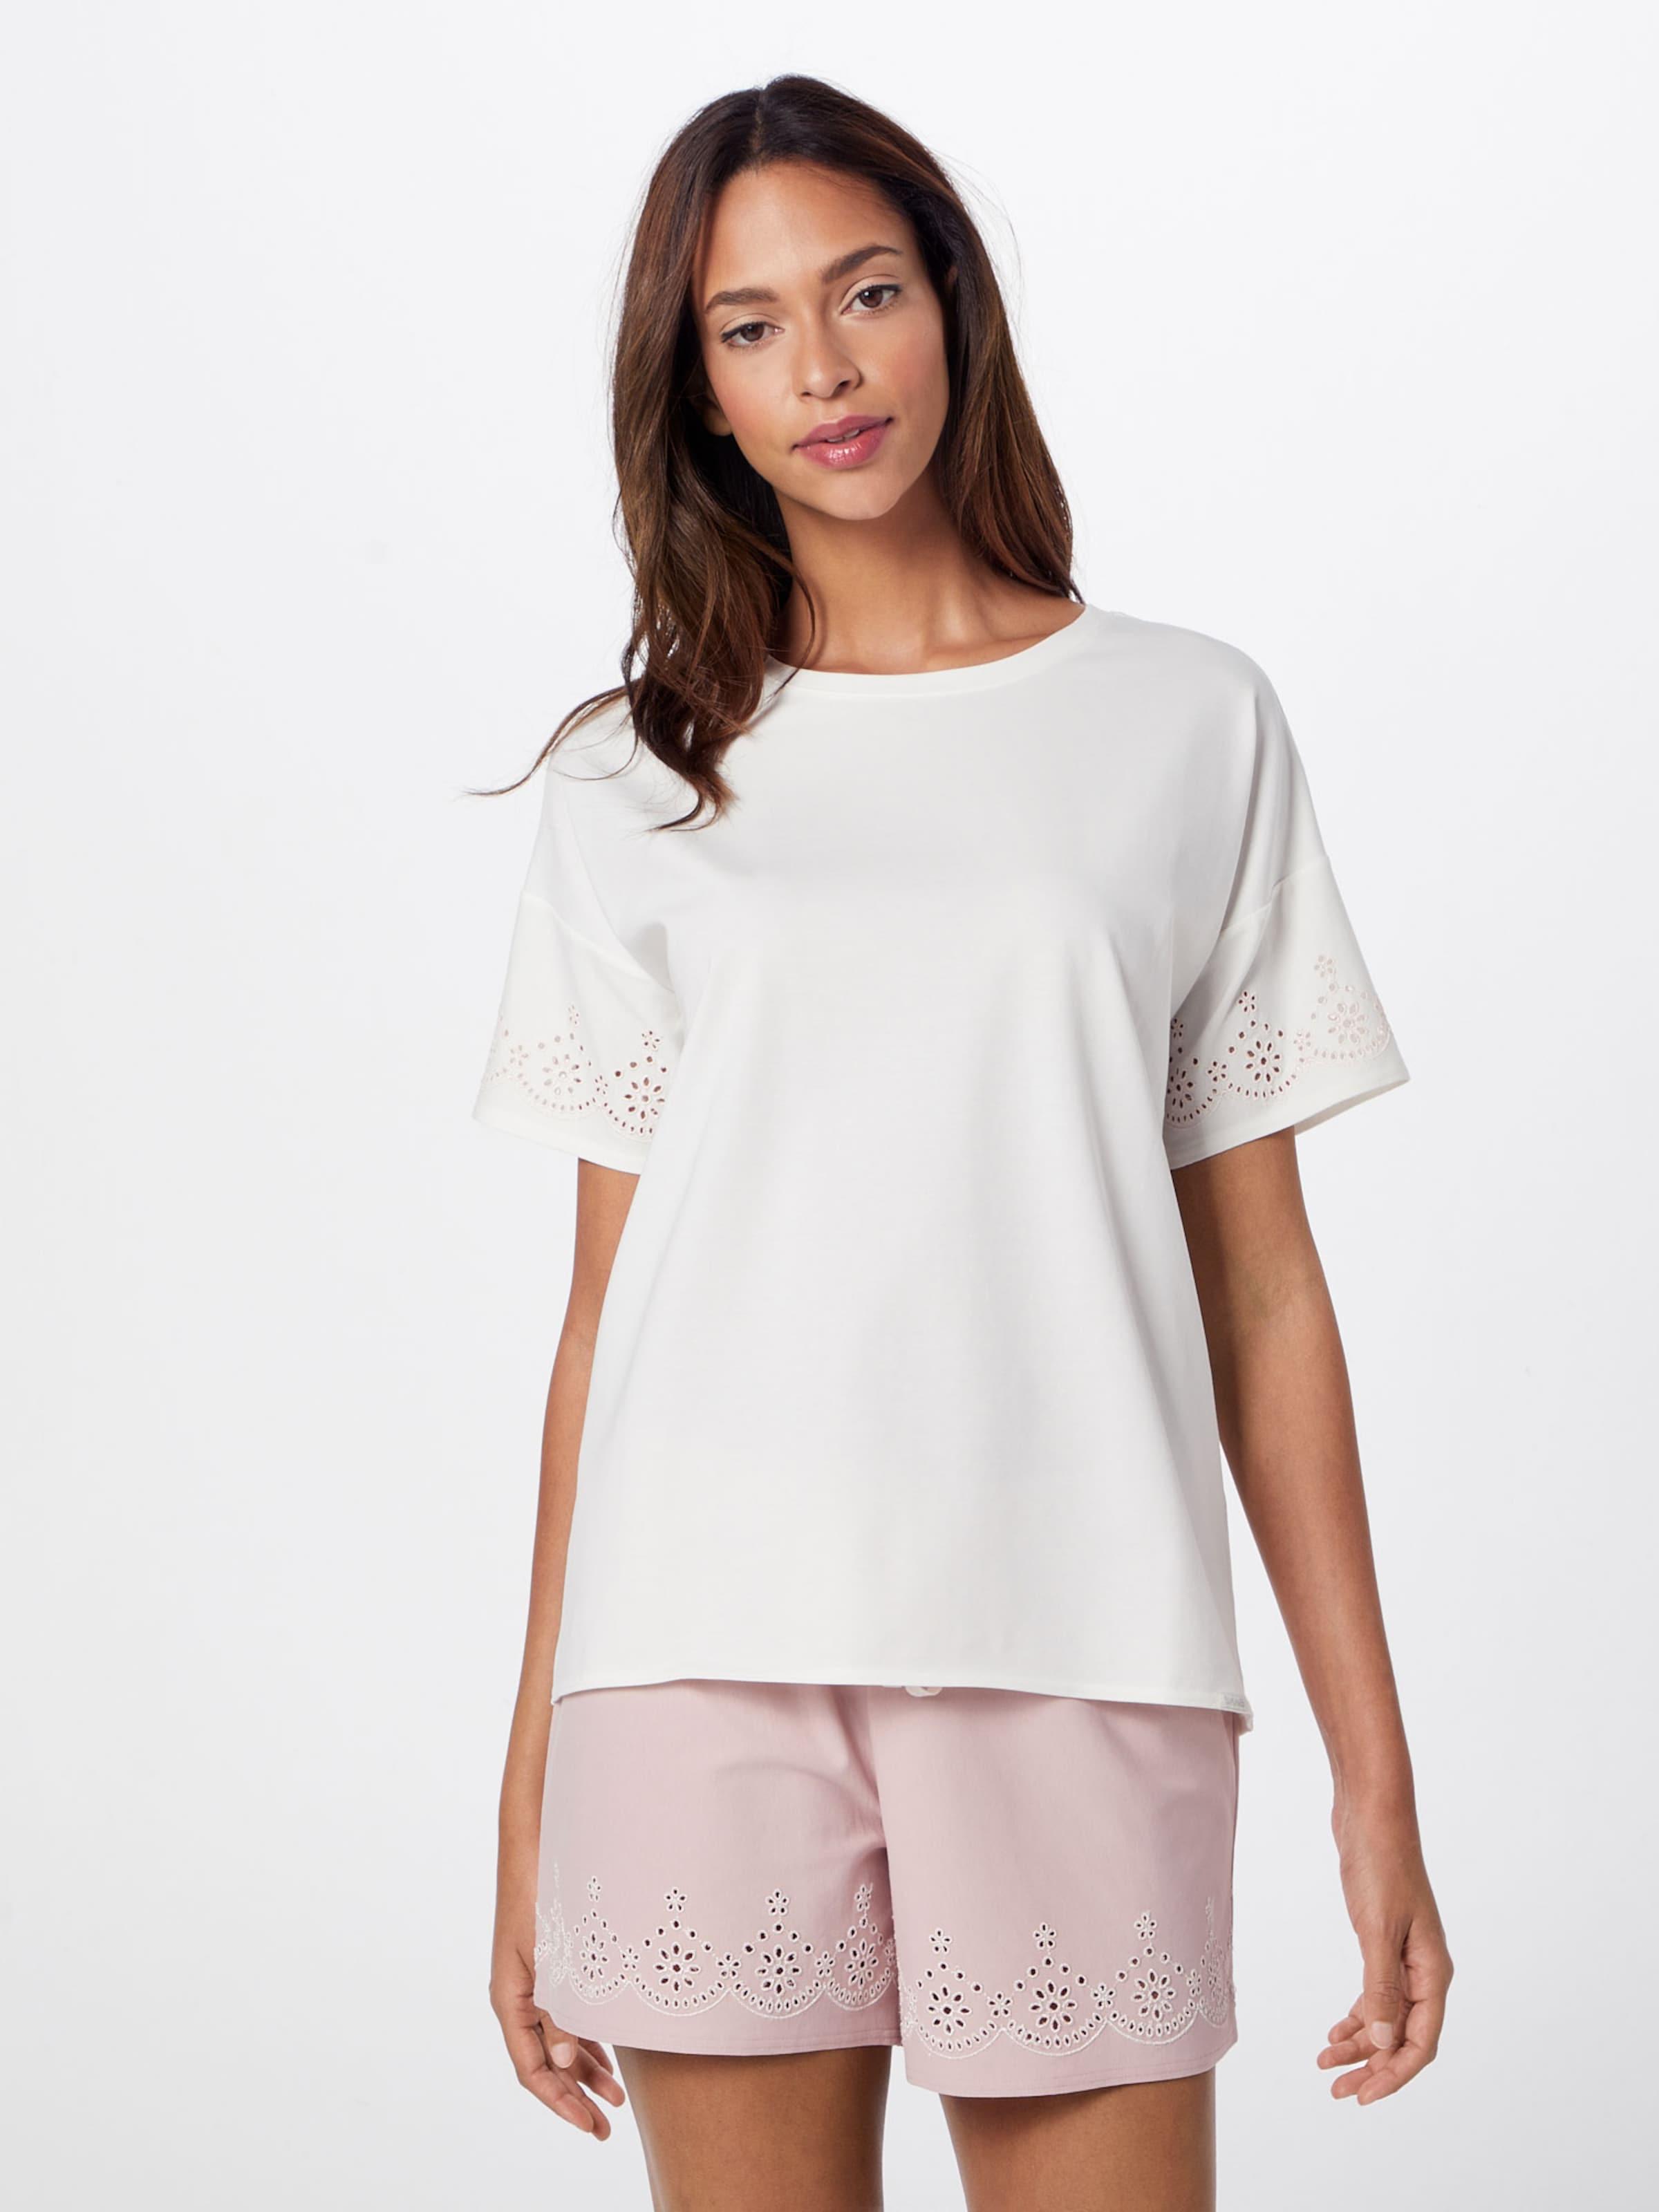 Shirt Match' In 'sleep Weiß Skiny Mixamp; fy6g7b